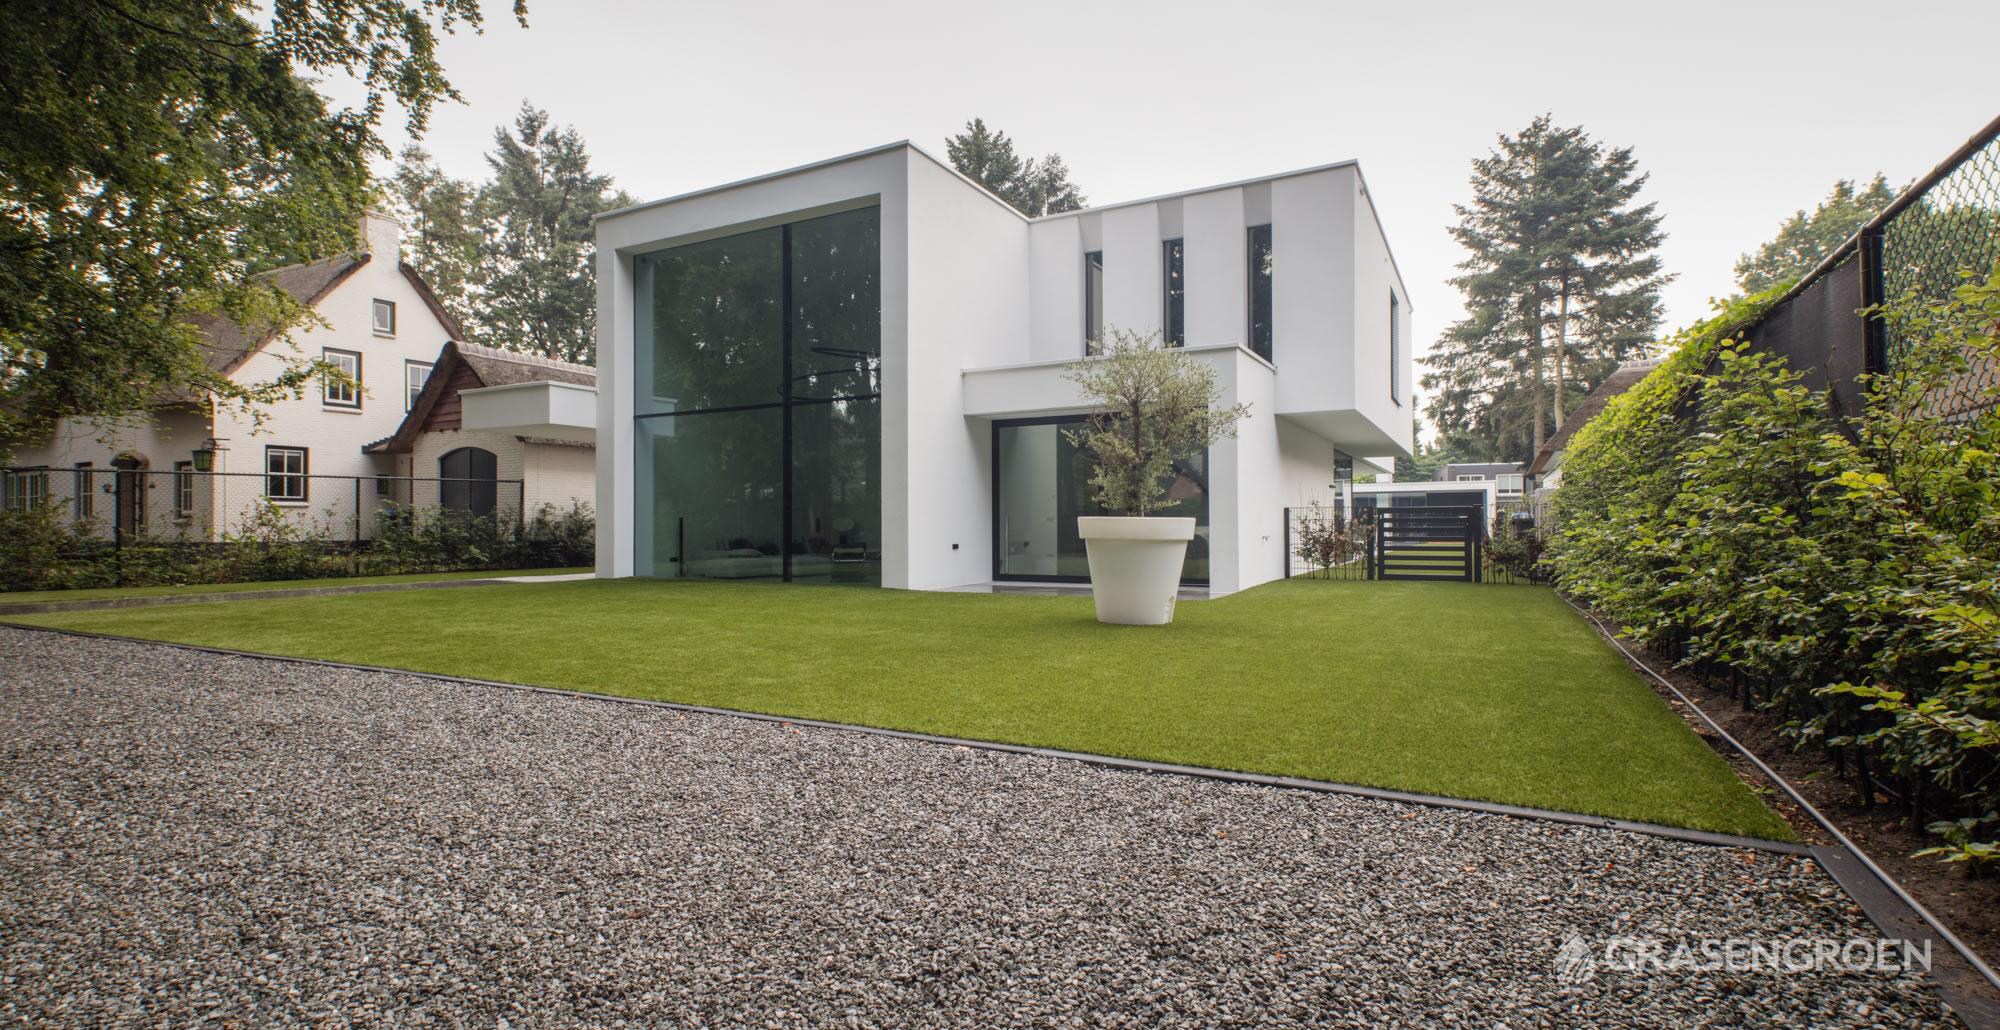 Kunstgrasleggenturnhout12 • Gras en Groen Kunstgras